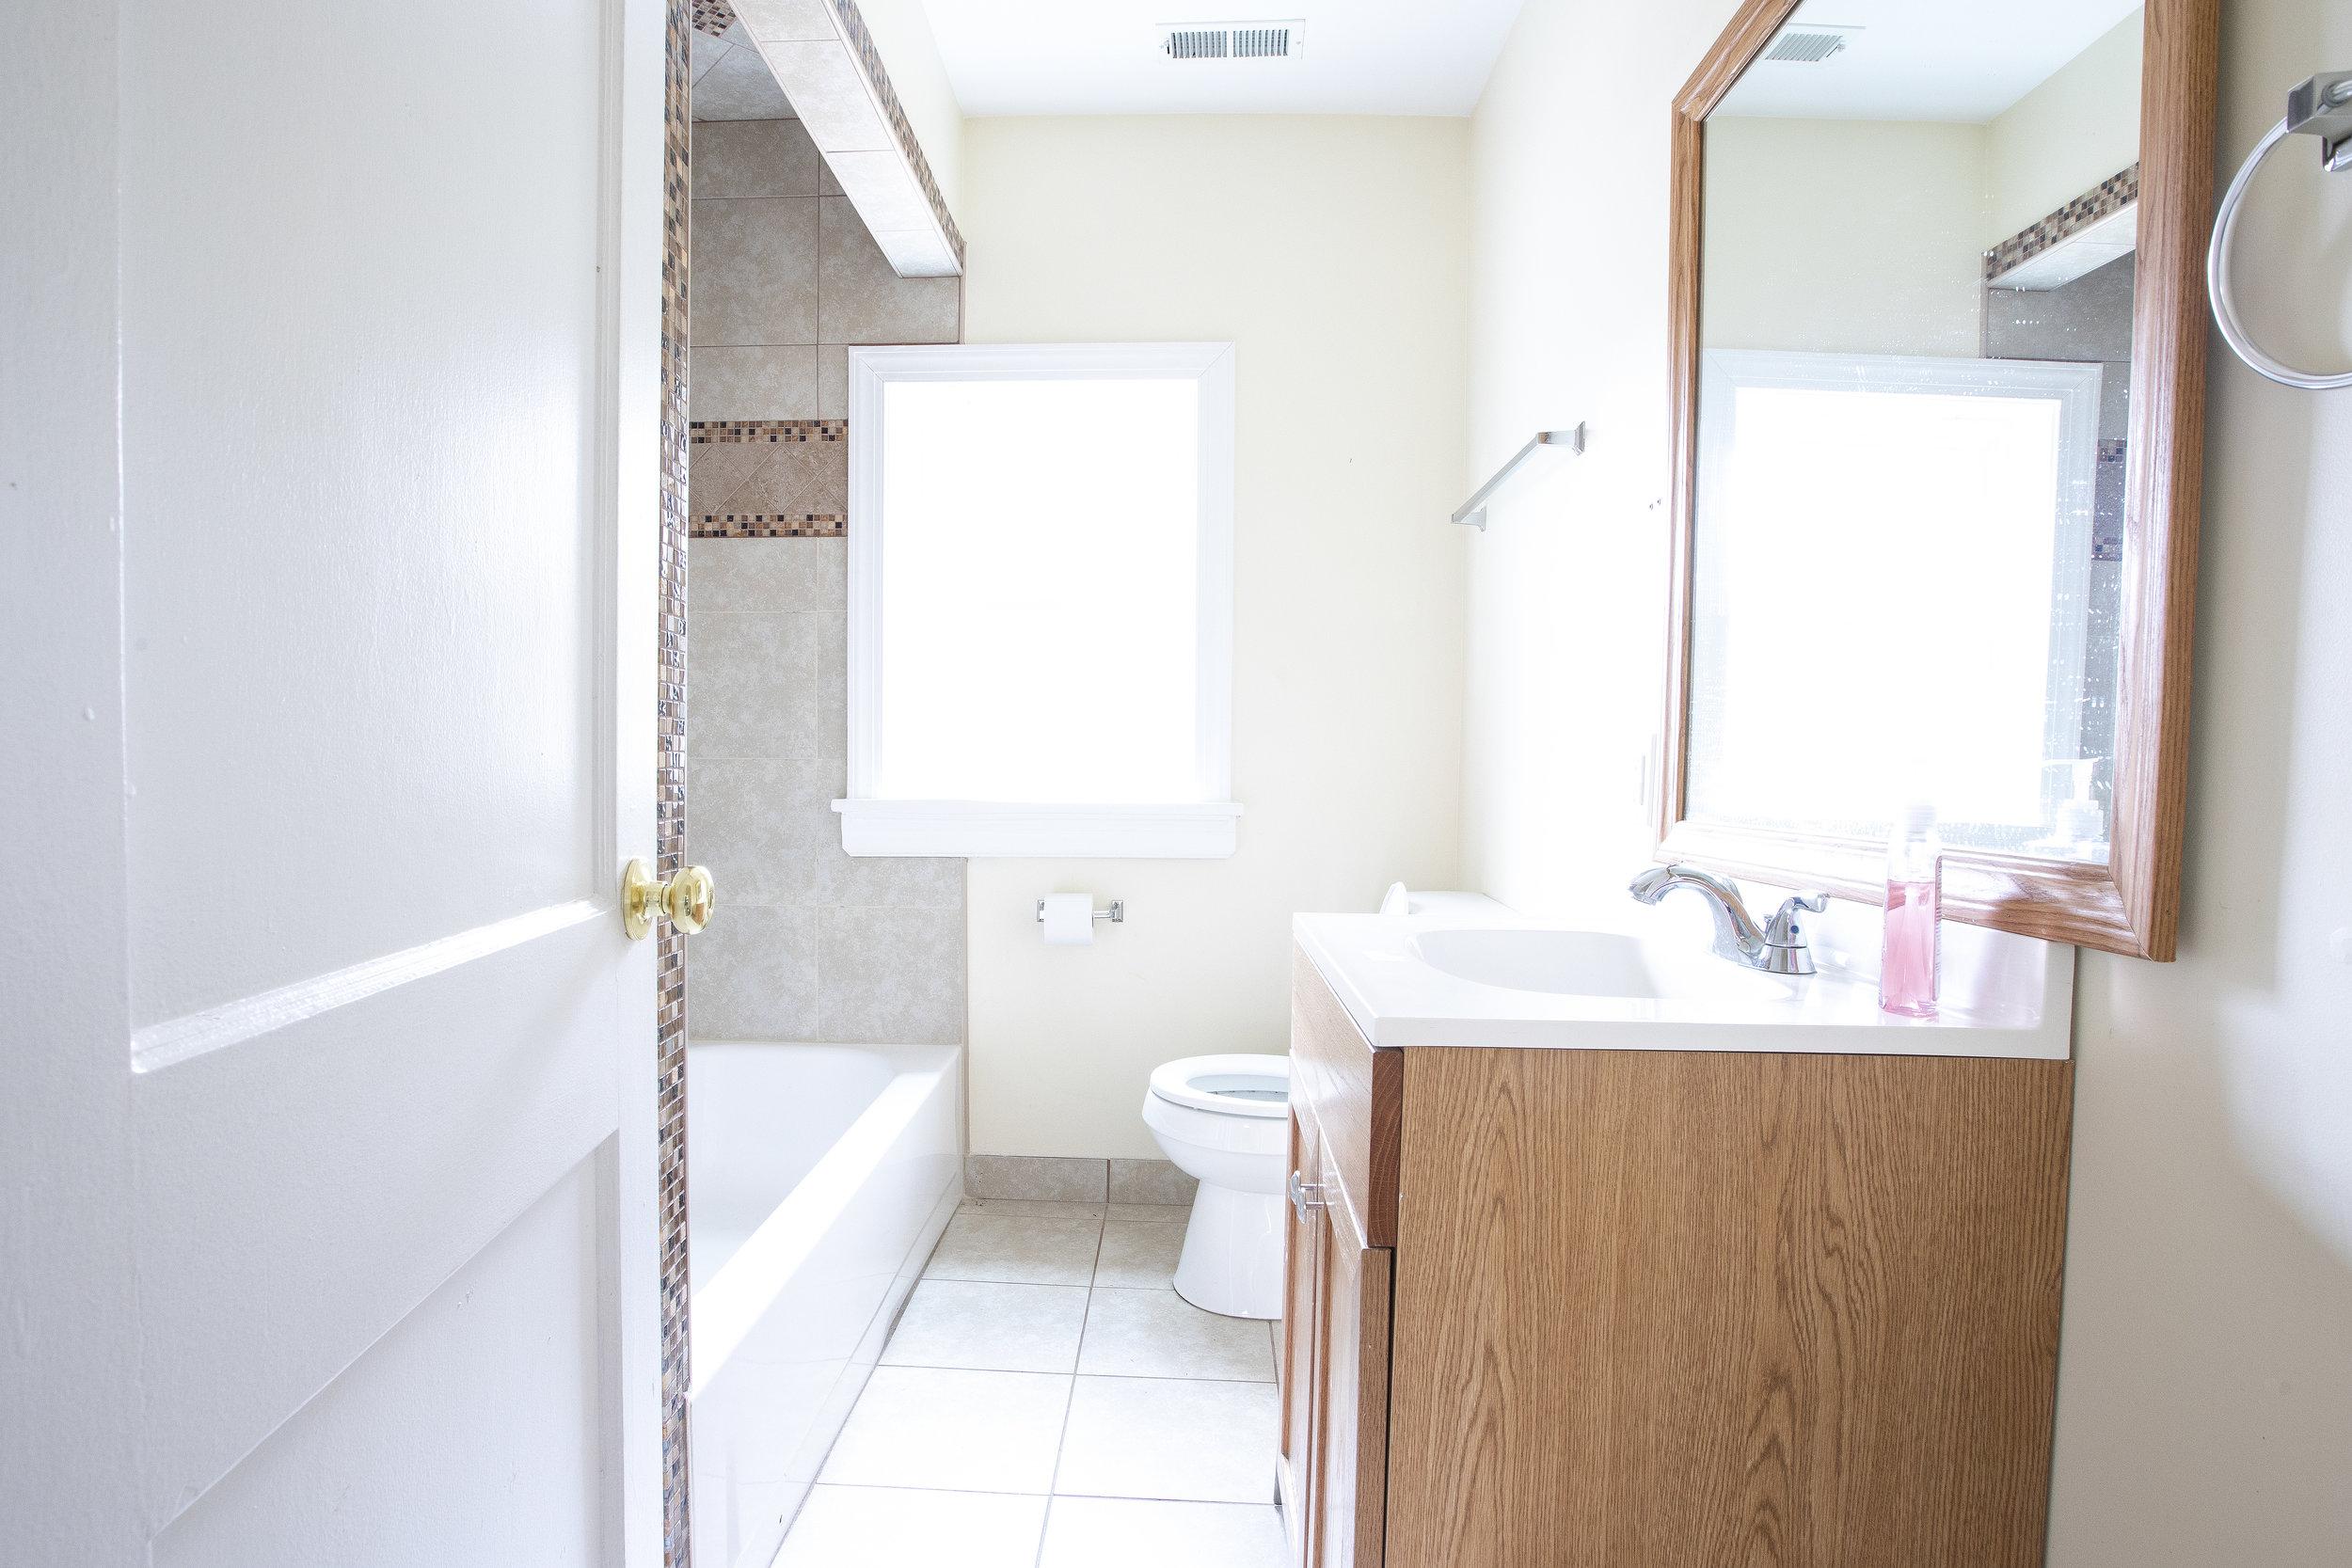 breedavis|airbnb|portfolio|3.jpg